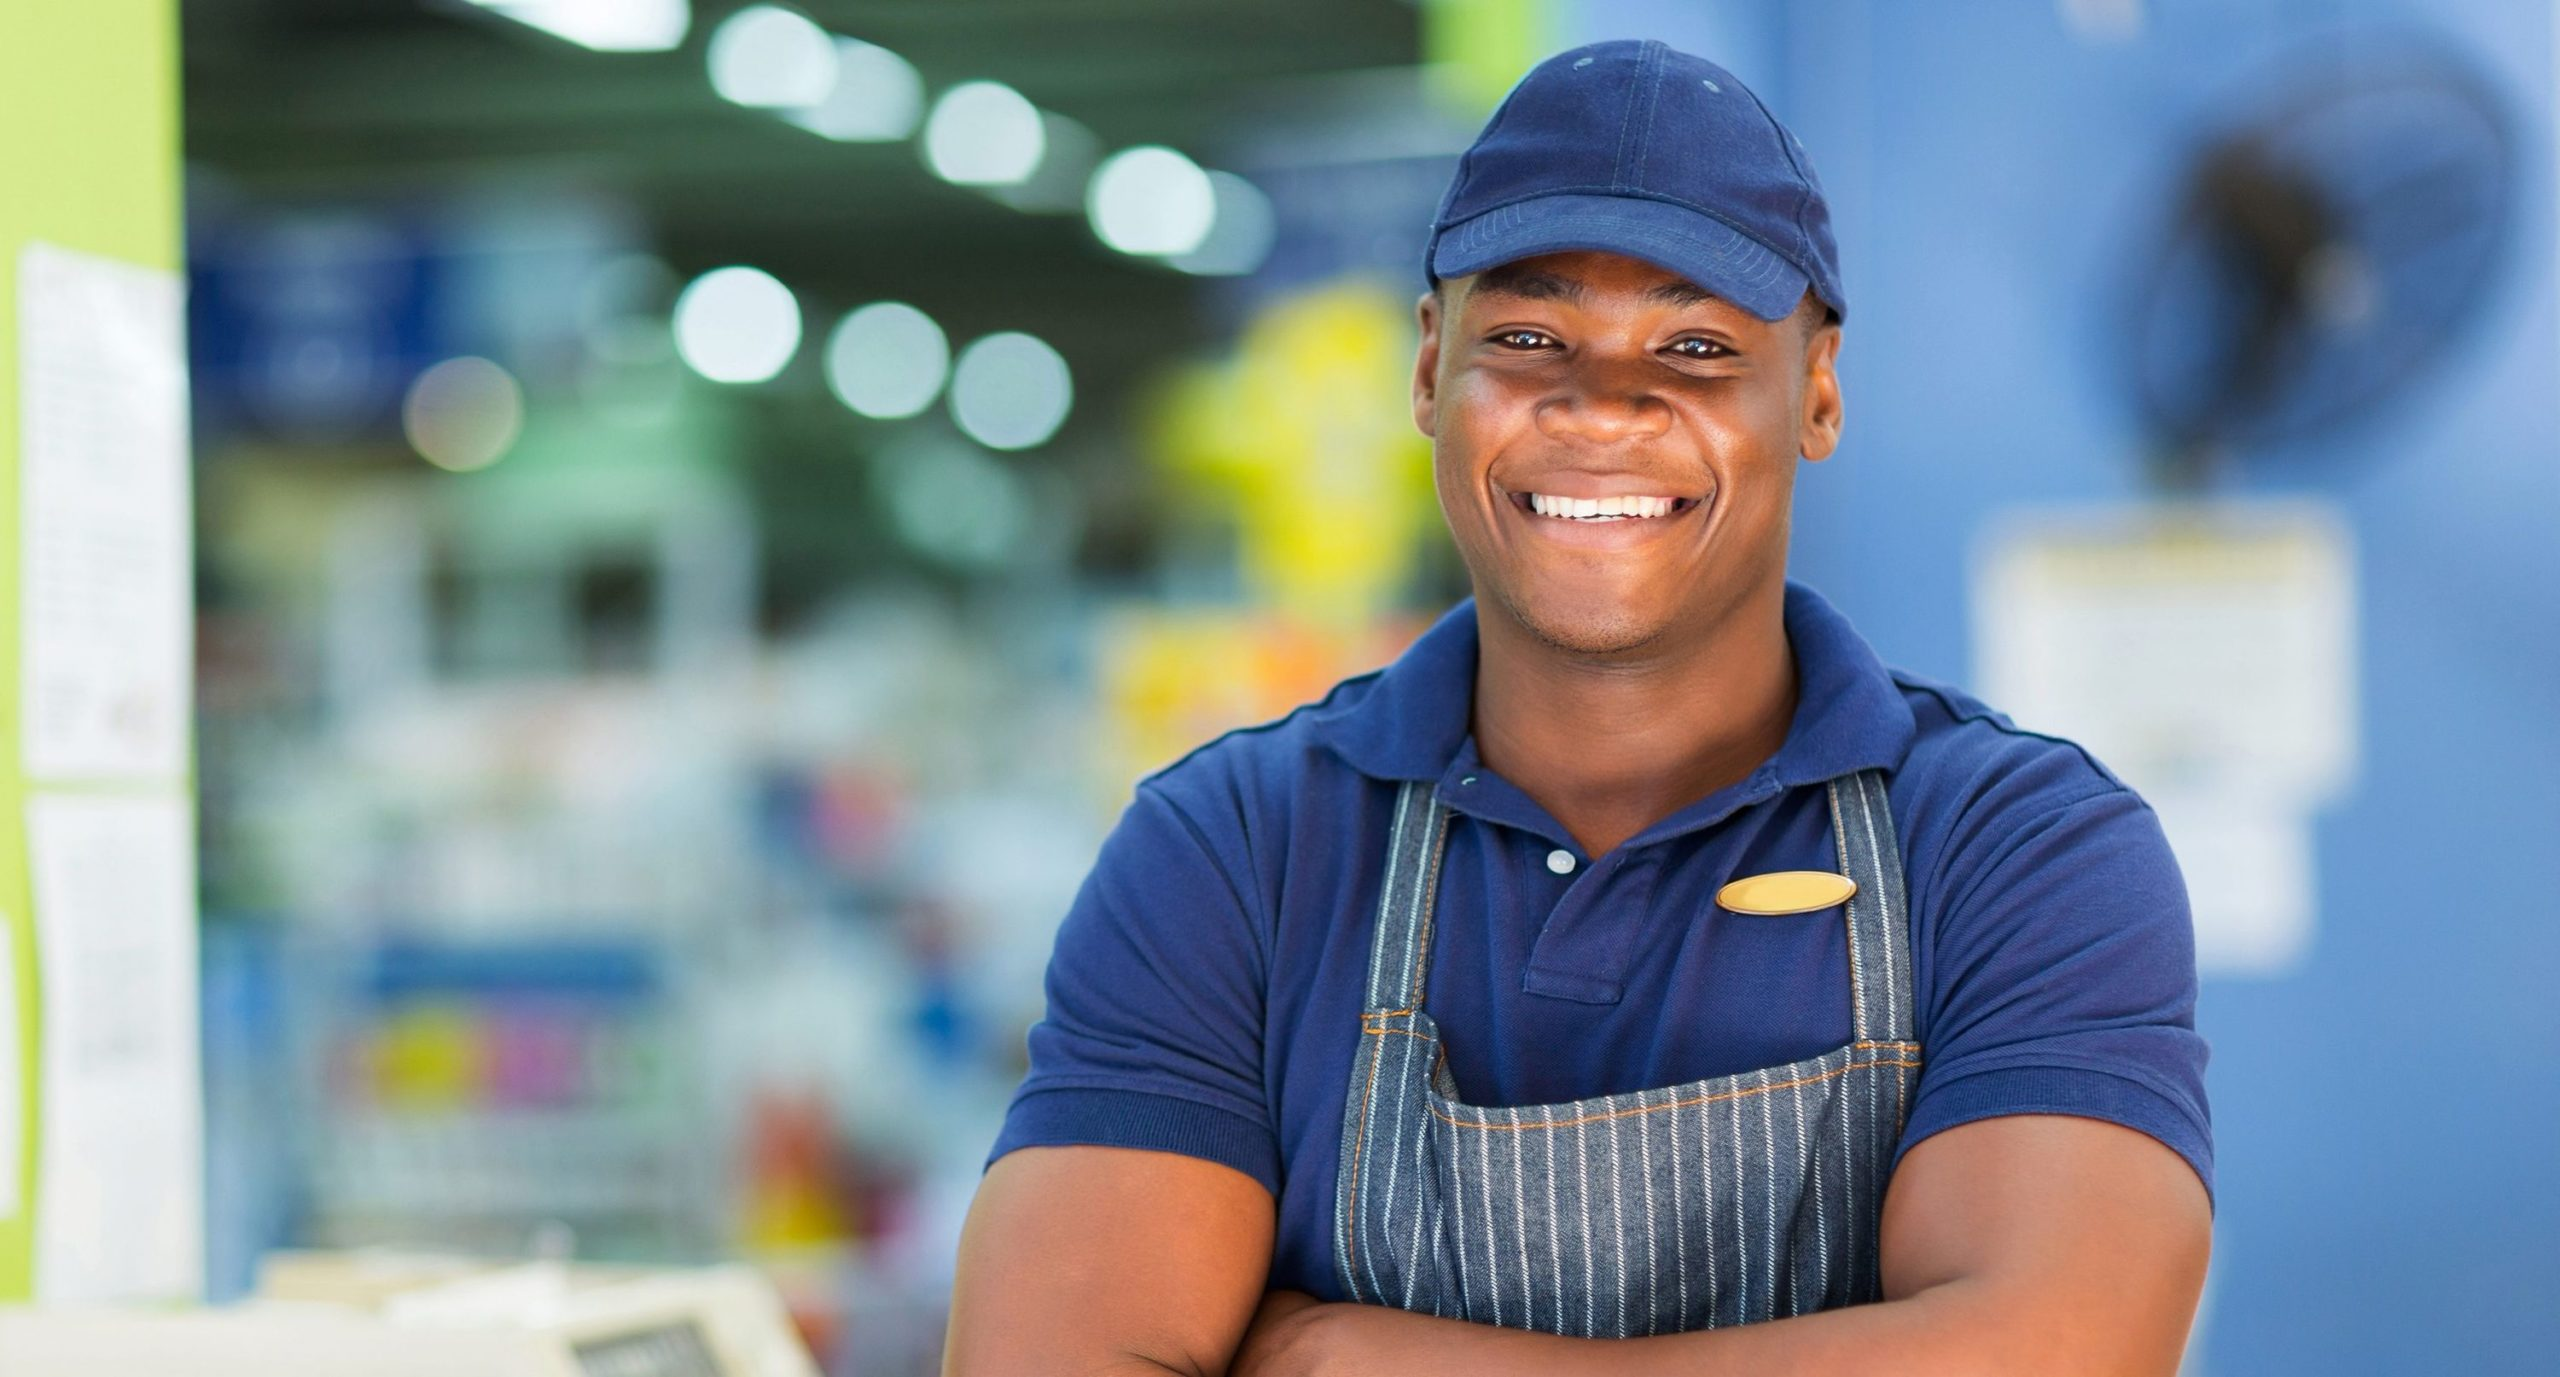 1.1.1-Community-Employment-e1498403041852